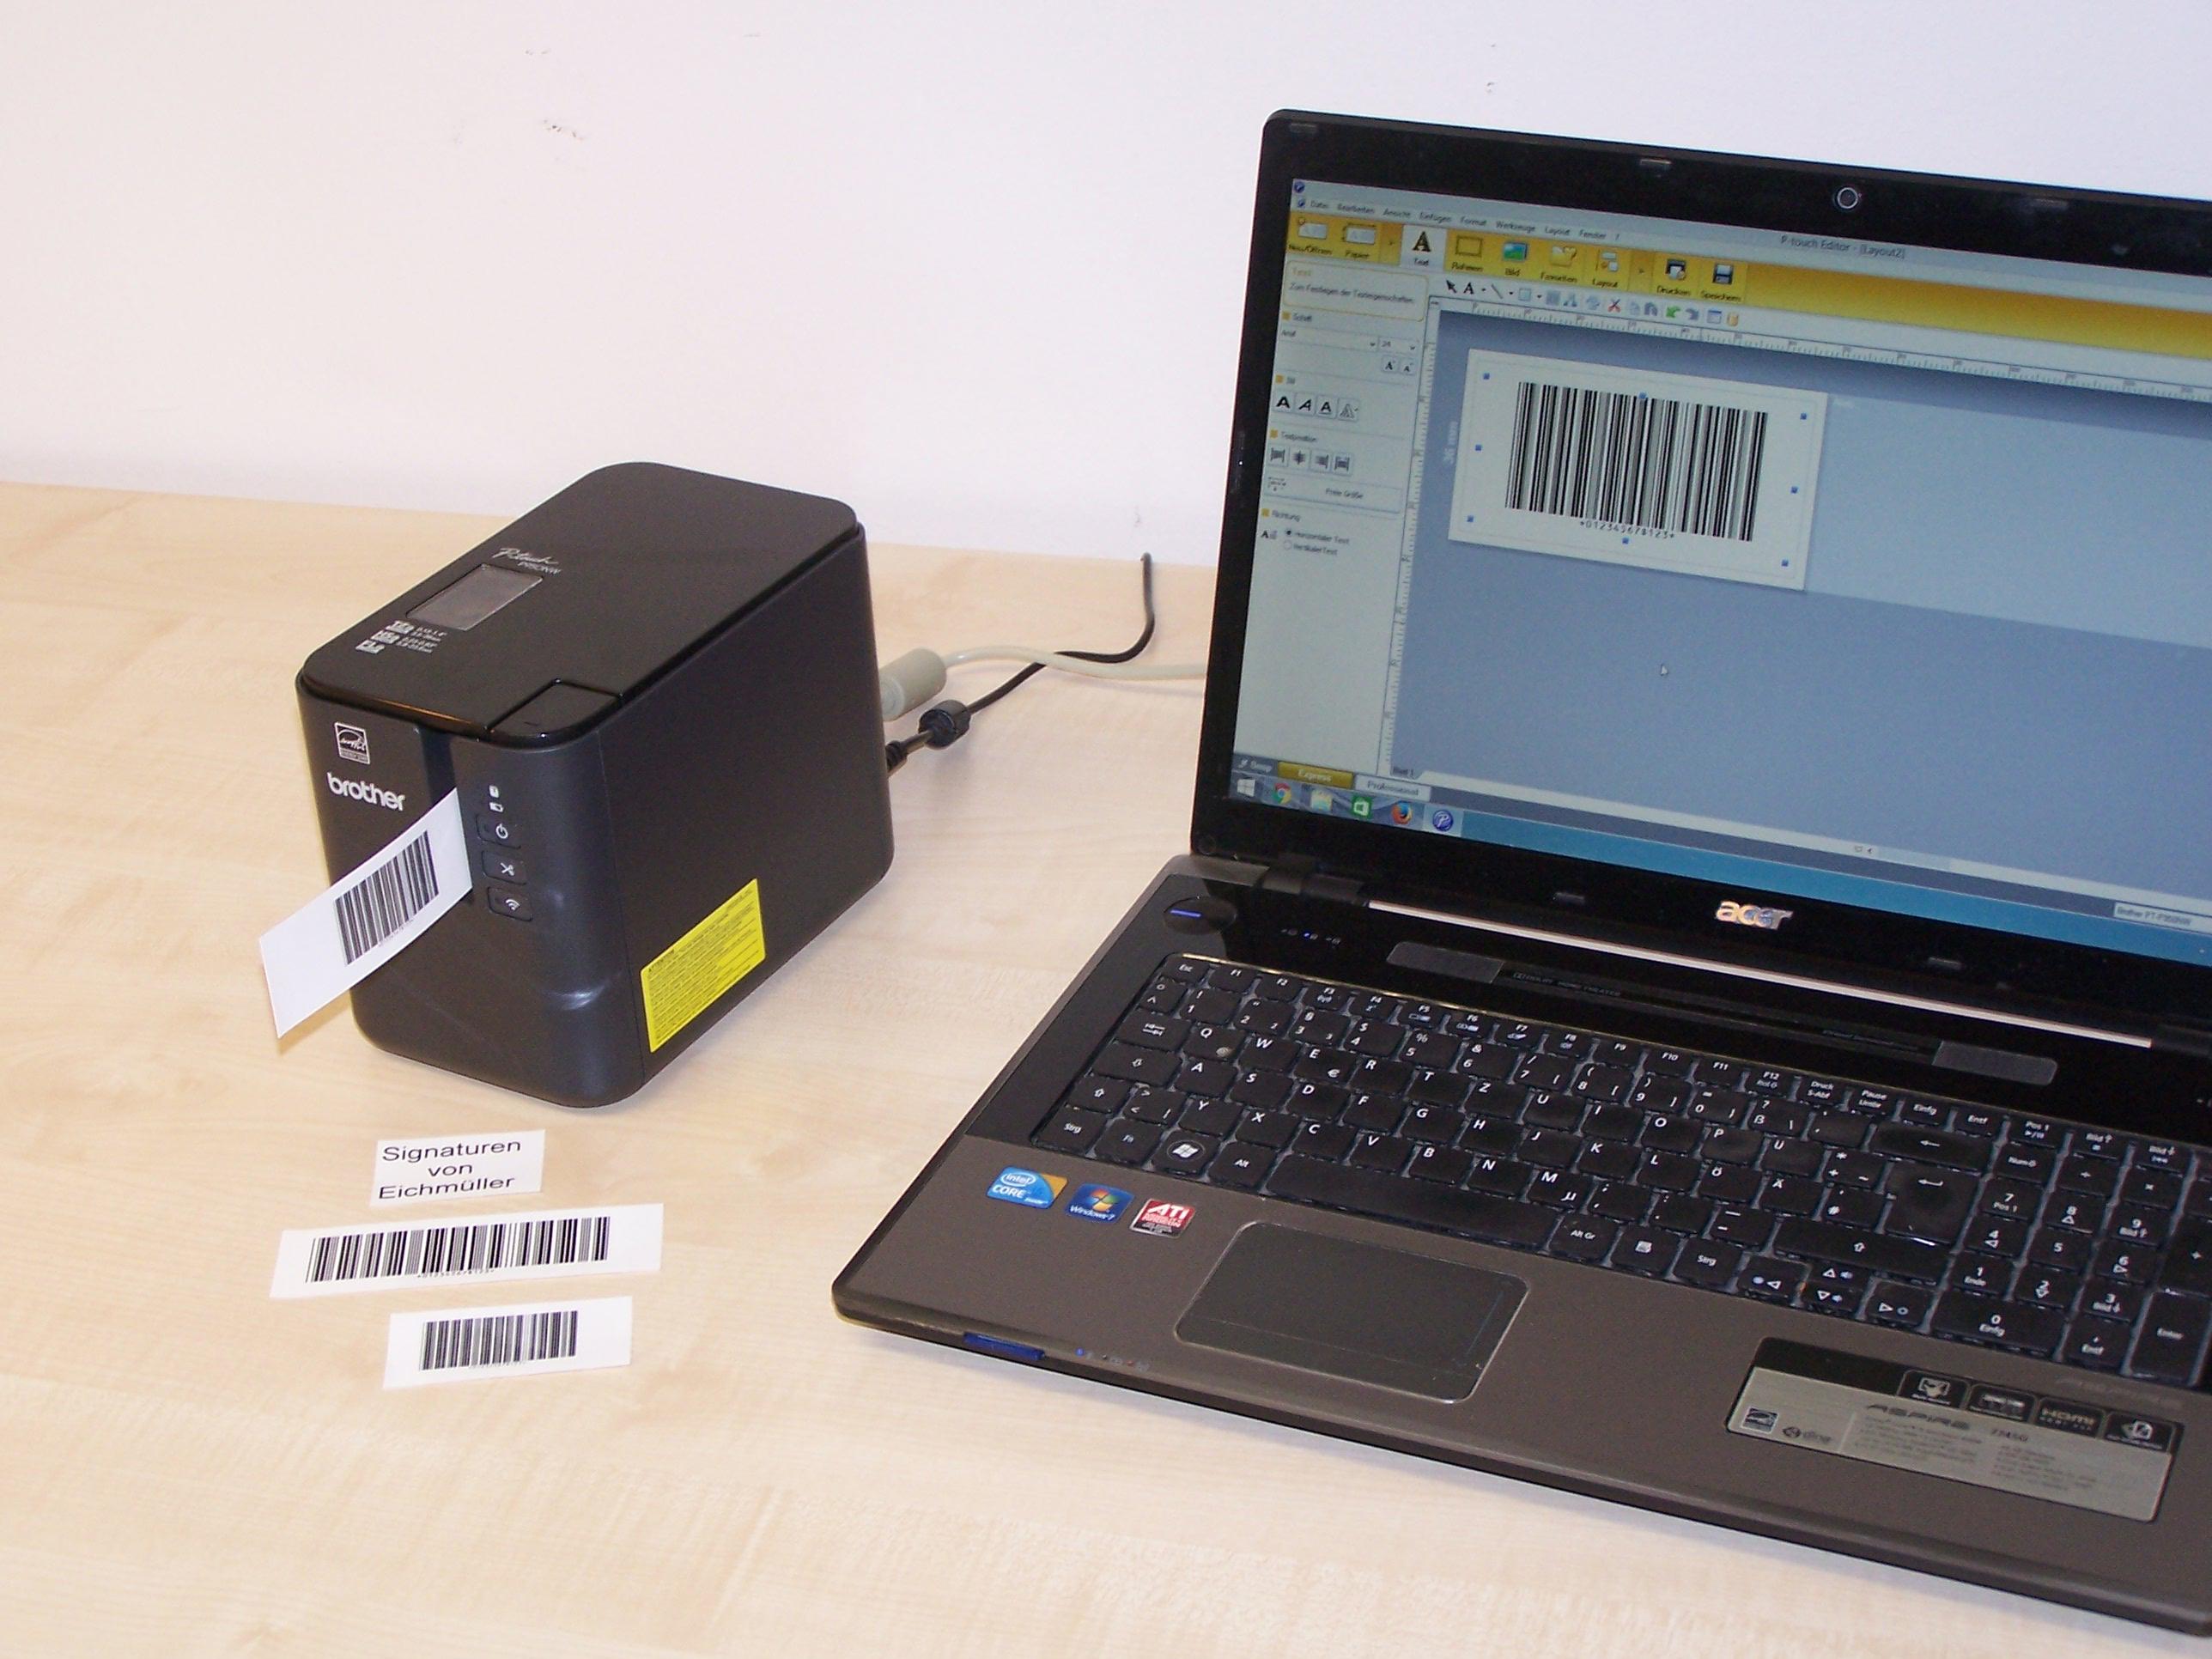 Signaturdrucker Brother P-touch P950NW inkl. Zubehör